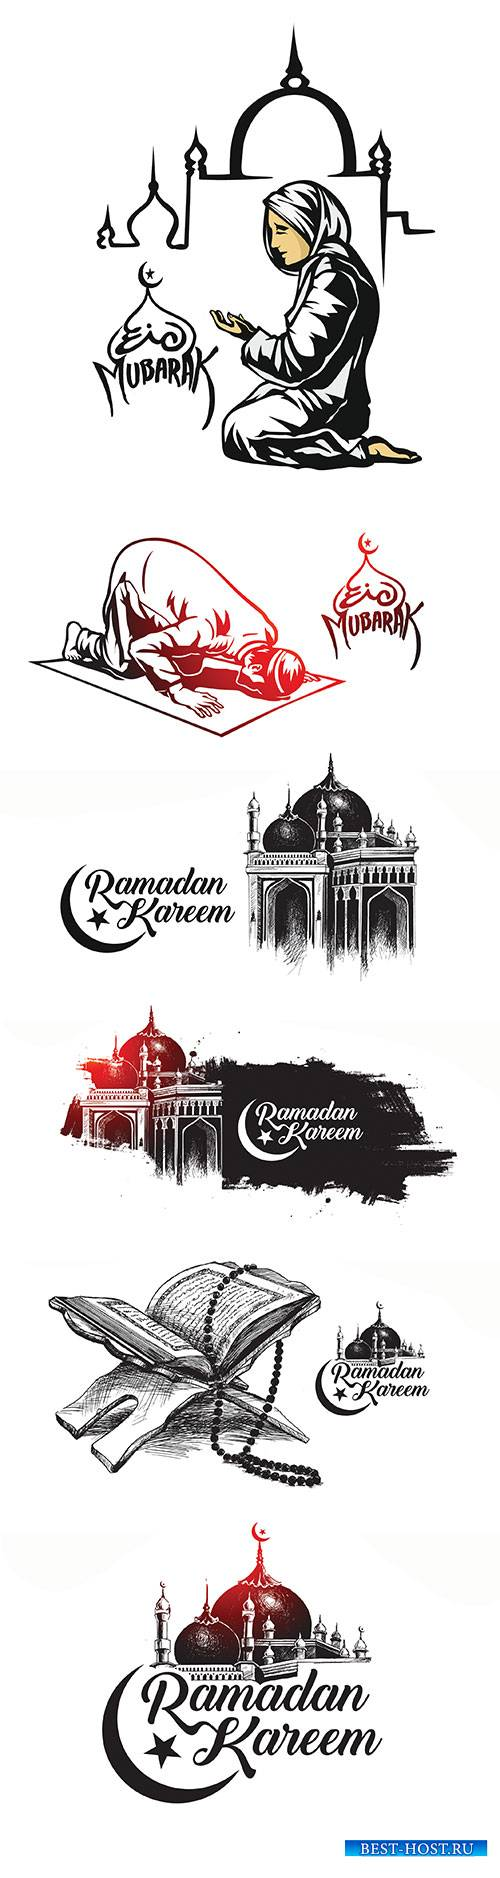 Ramadan Kareem calligraphy stylish lettering